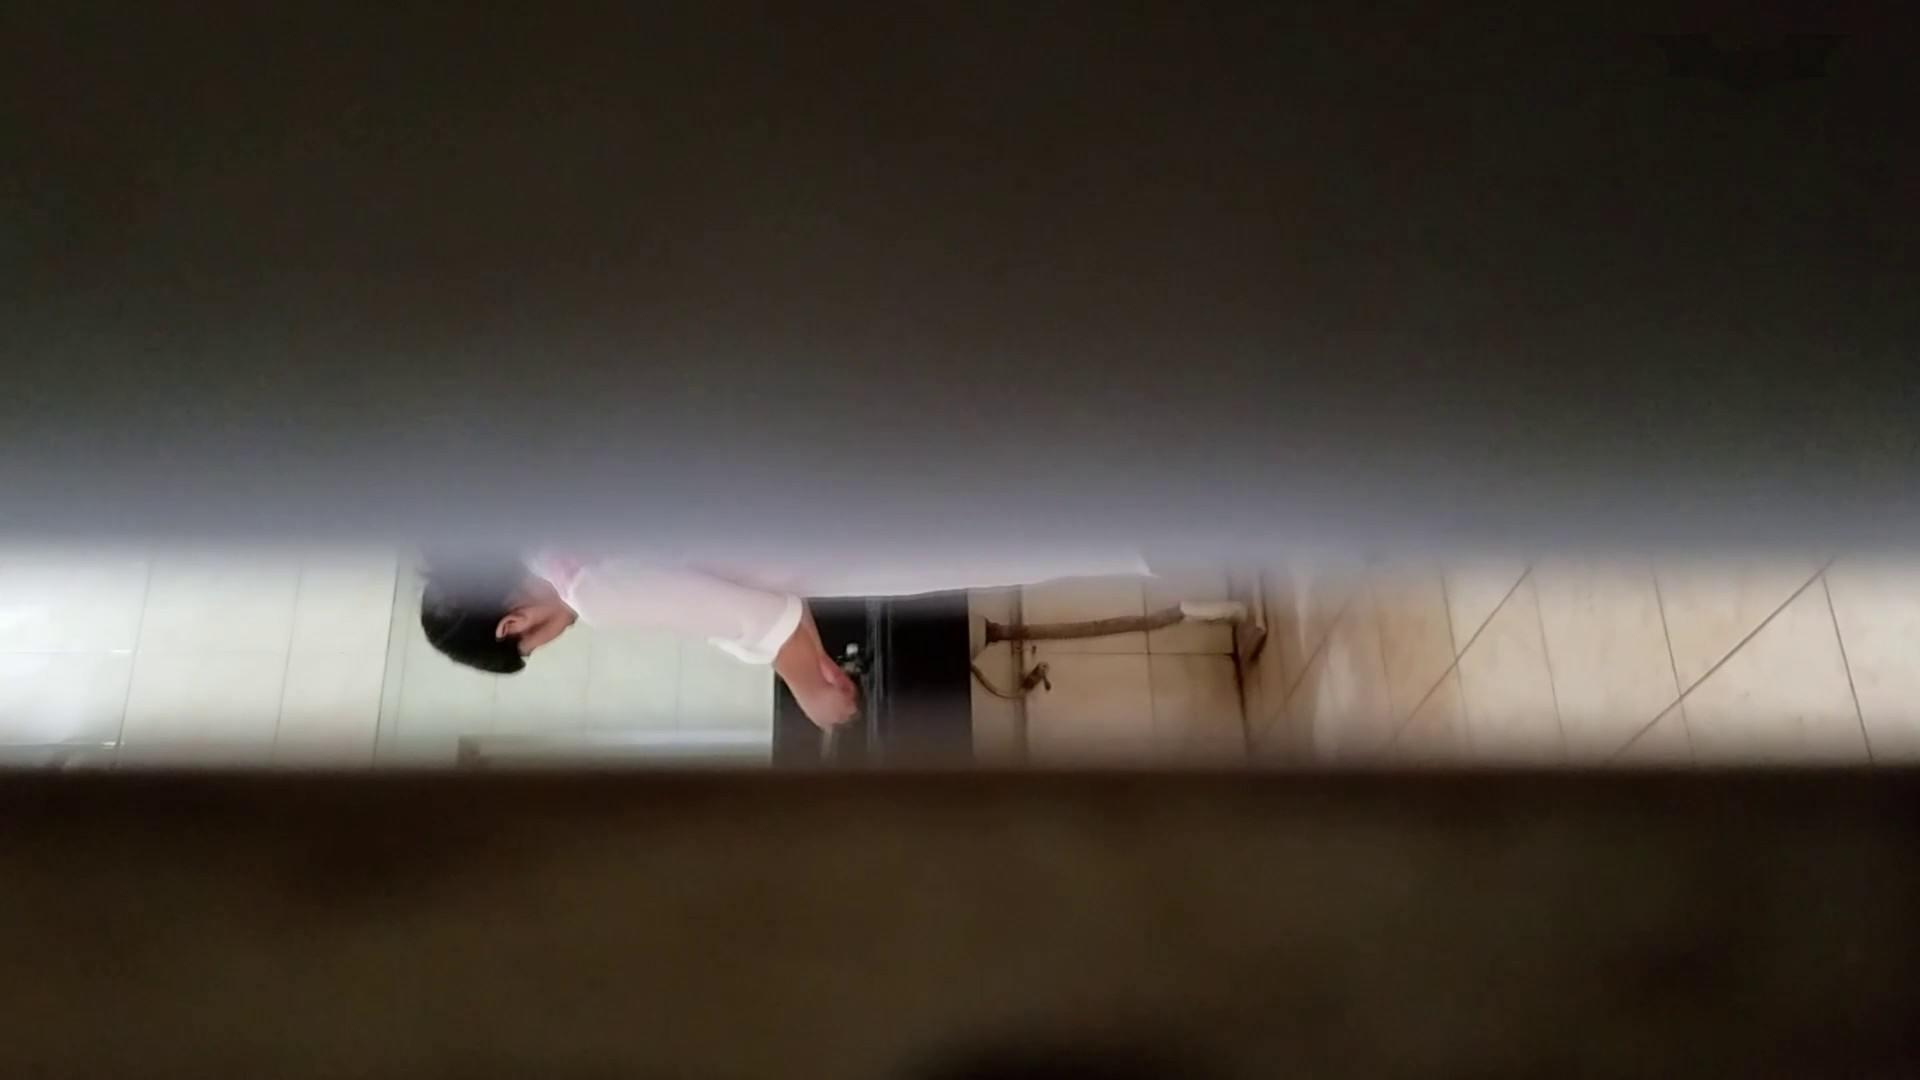 JD盗撮 美女の洗面所の秘密 Vol.75 盛合せ エロ無料画像 110画像 81